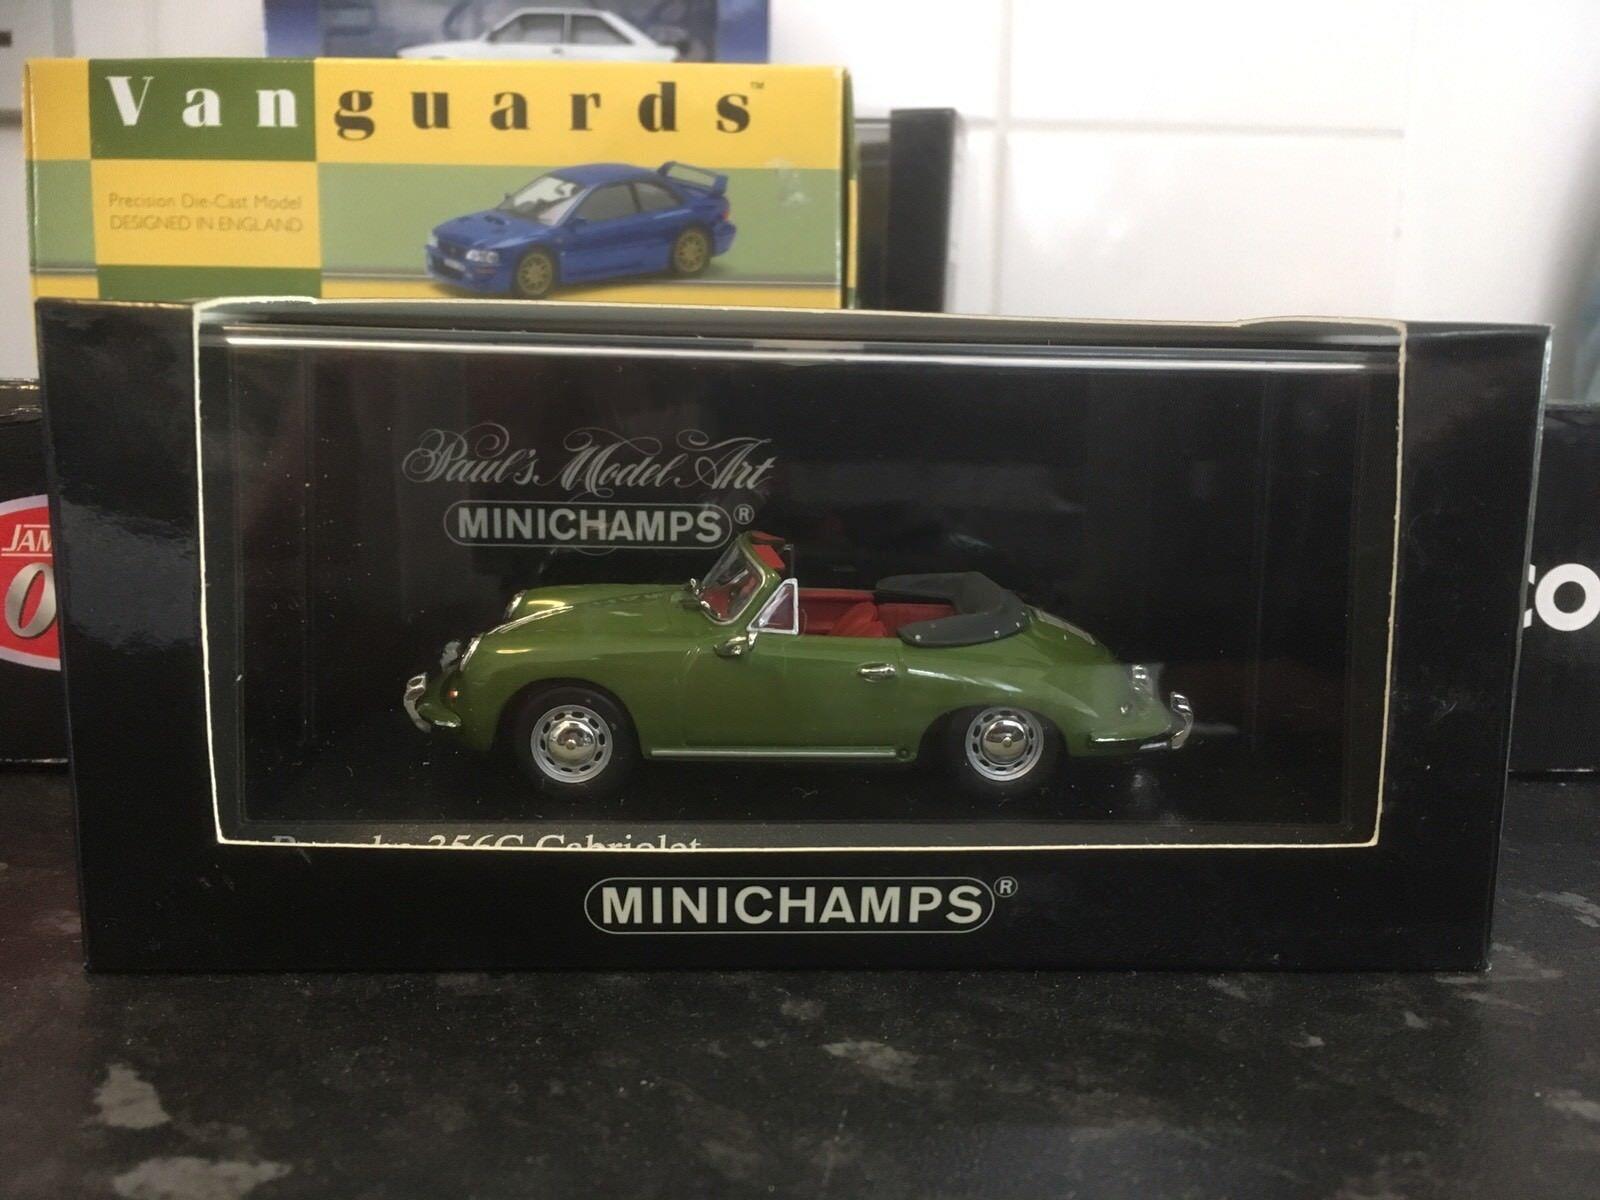 Minichamps Porsche 356C Cabriolet 1965 Green Weidengrun 1 43 MIB Ltd Ed